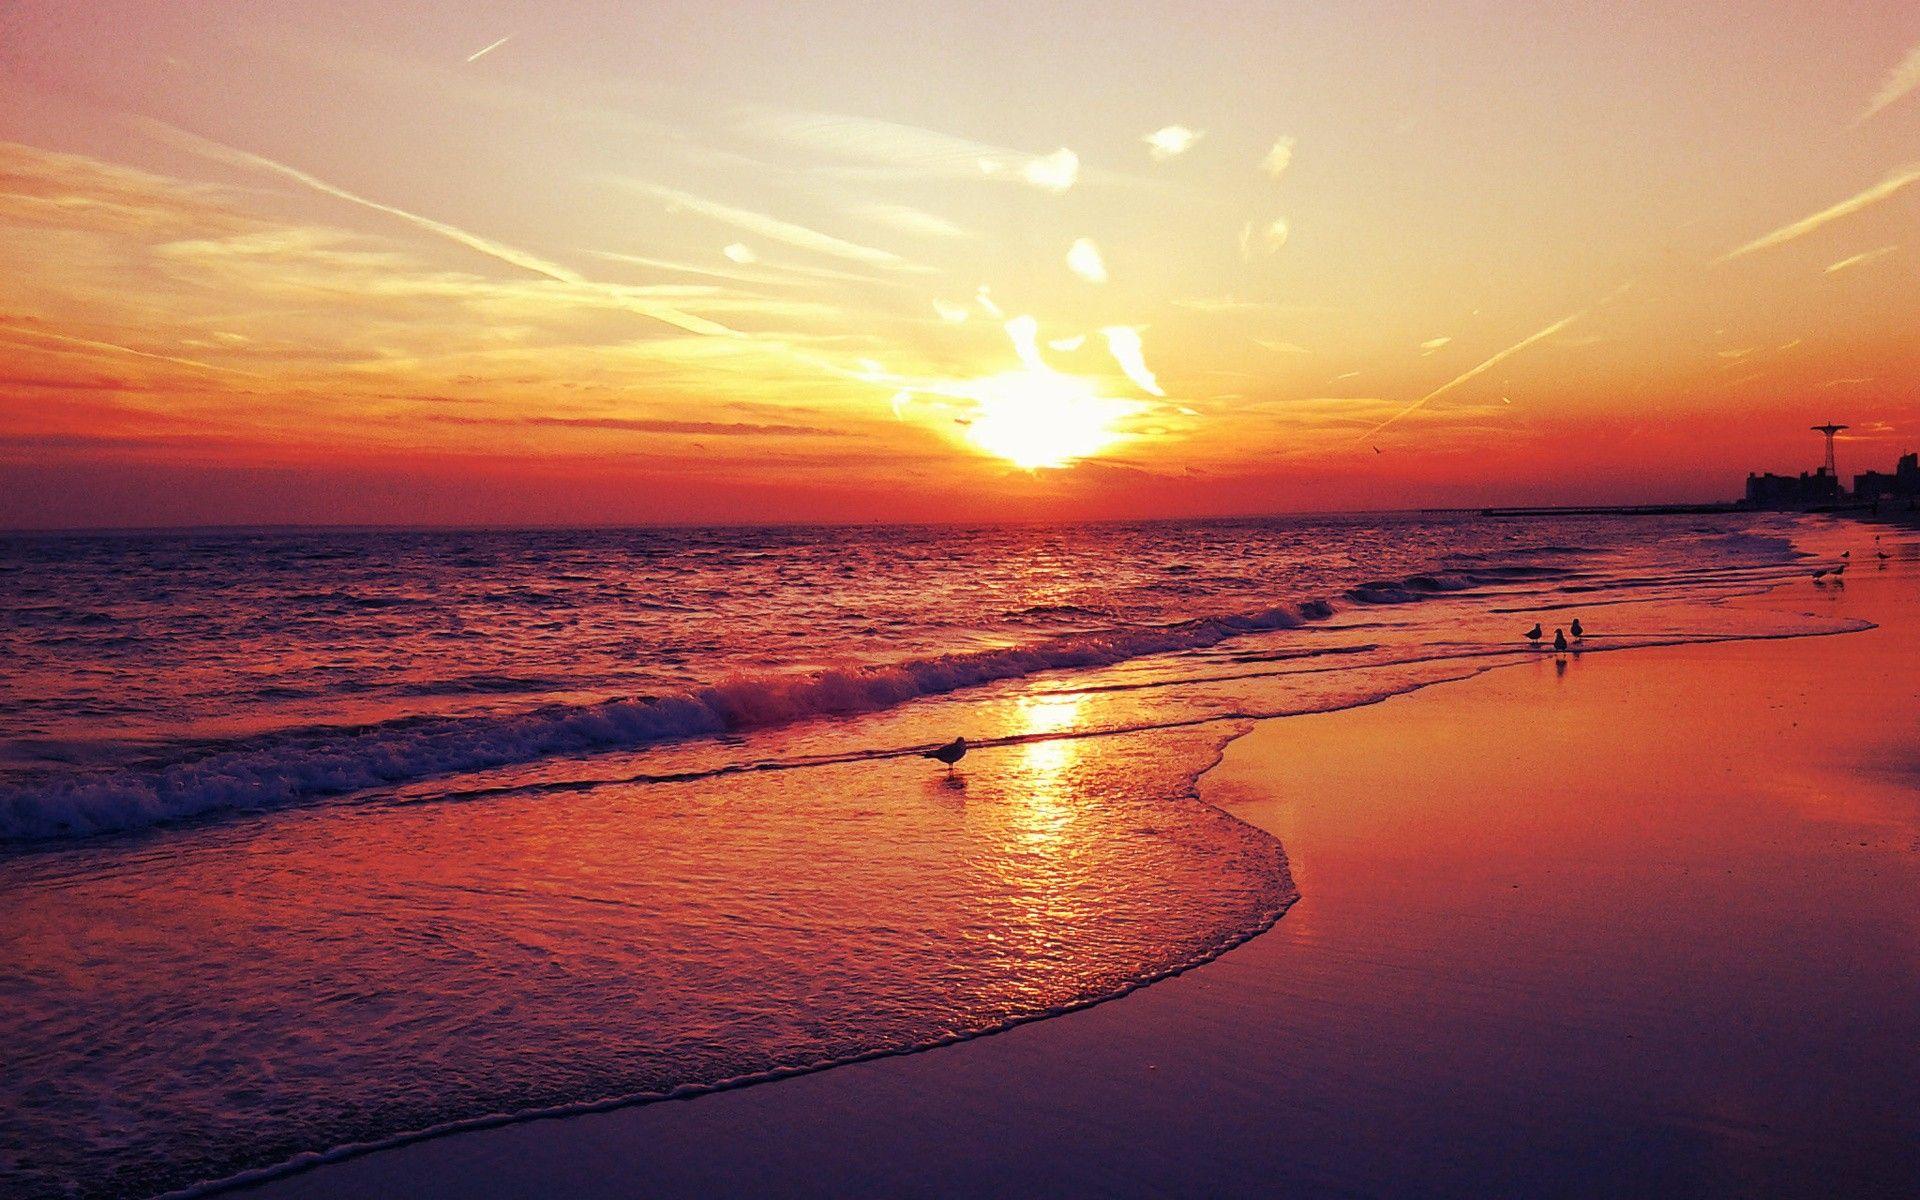 Permalink to Hq Beach Sunset Wallpaper